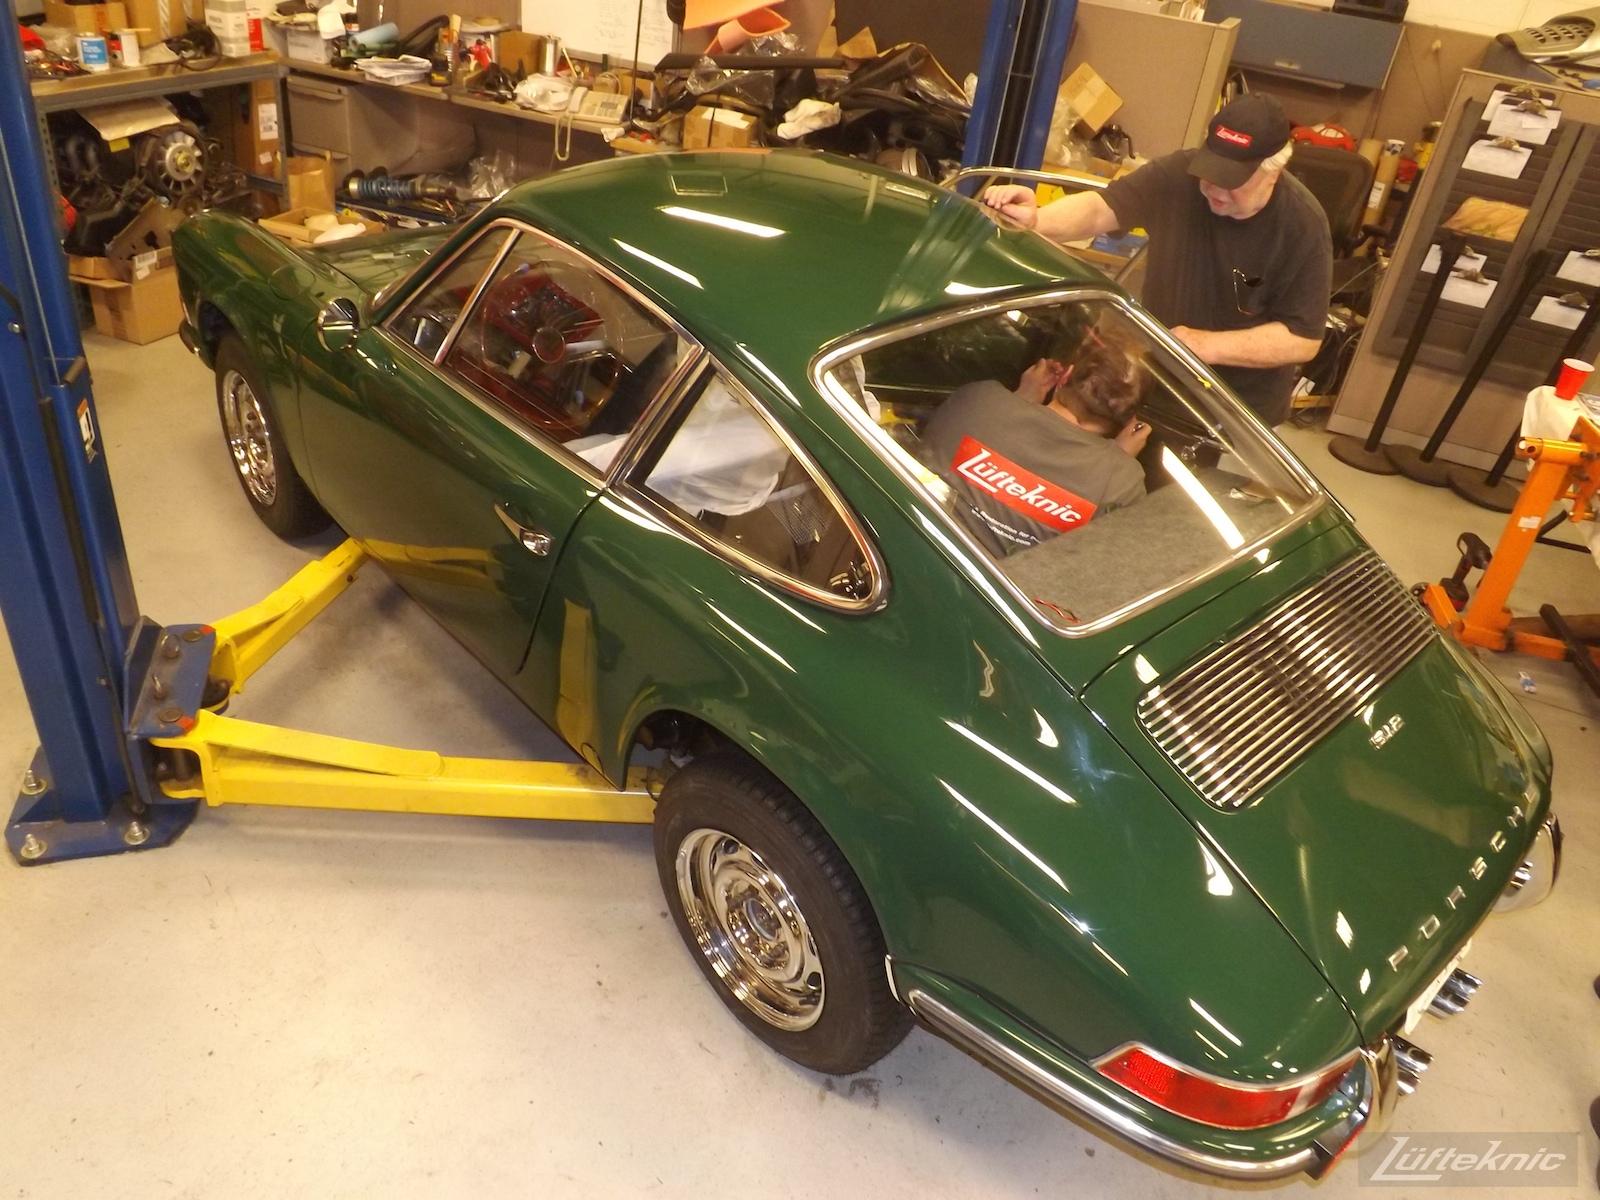 Installing windows into an Irish Green Porsche 912 undergoing restoration at Lufteknic.